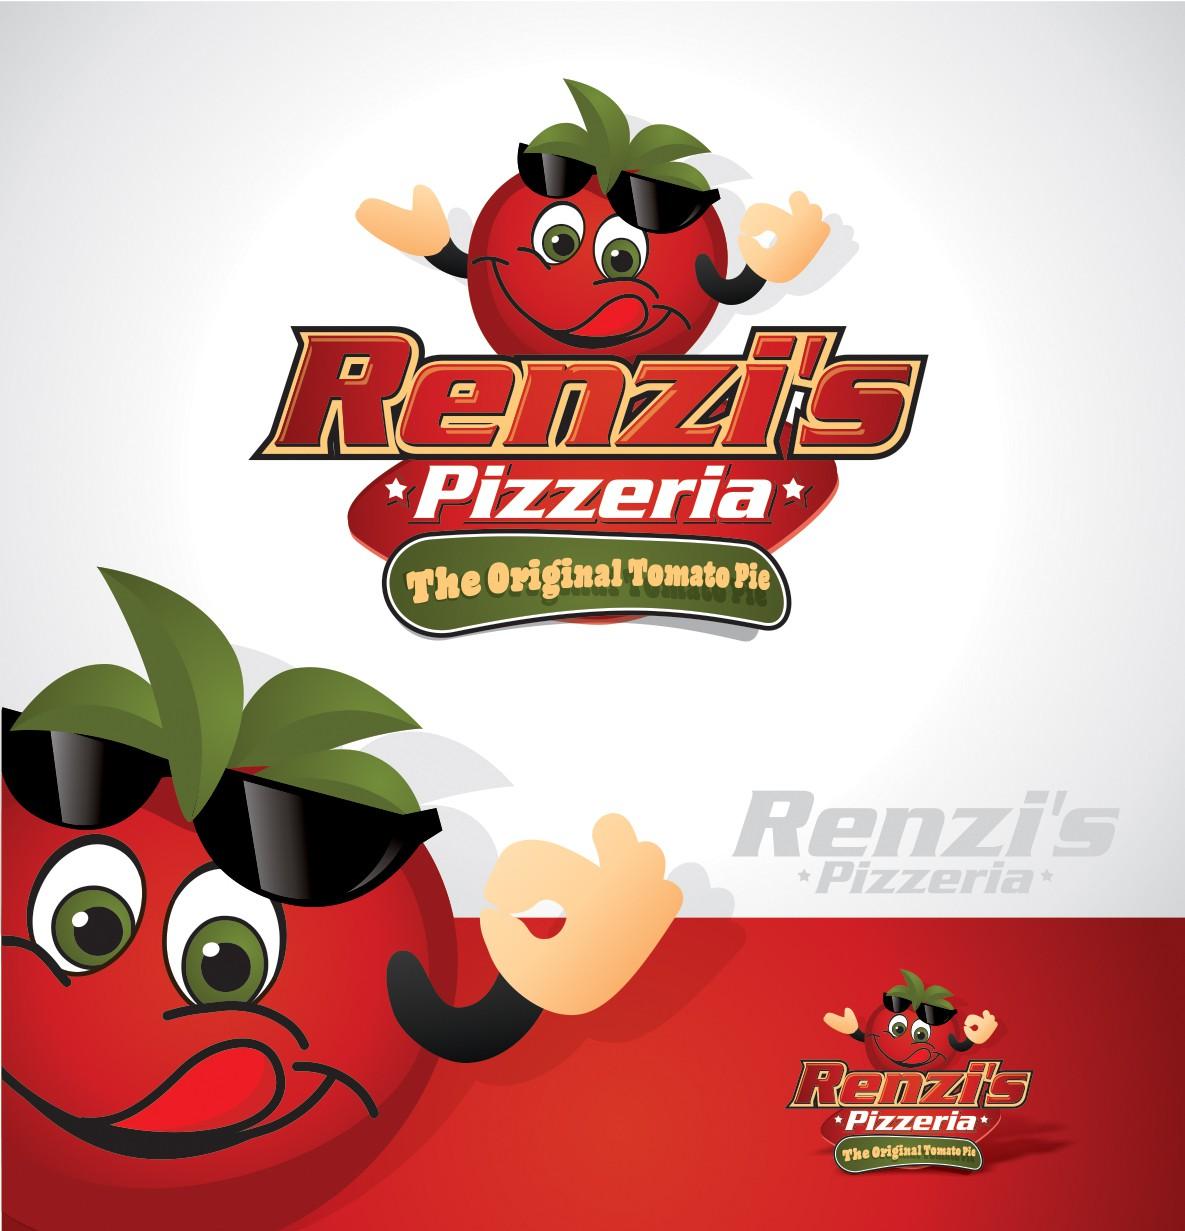 Create the next logo for Renzi's Pizzeria